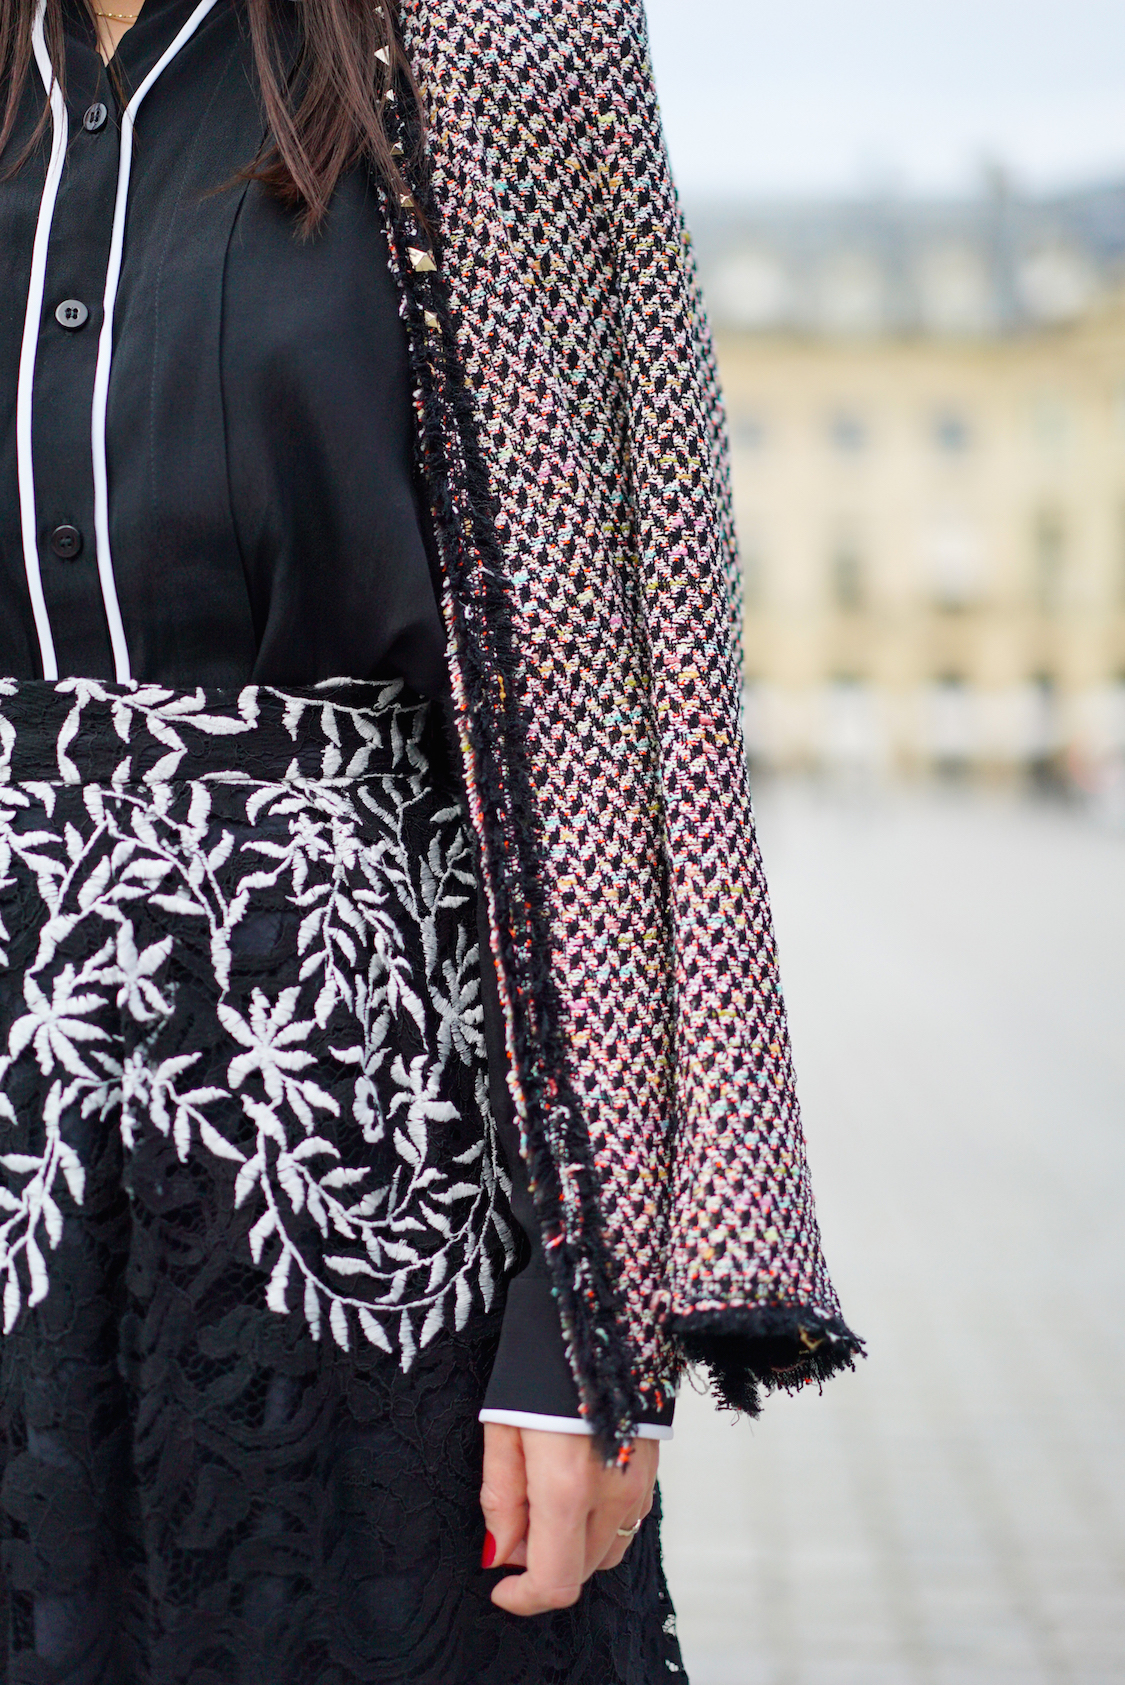 look-paris-fashion-week-re-see-valentino-2015-danielle-noce-6